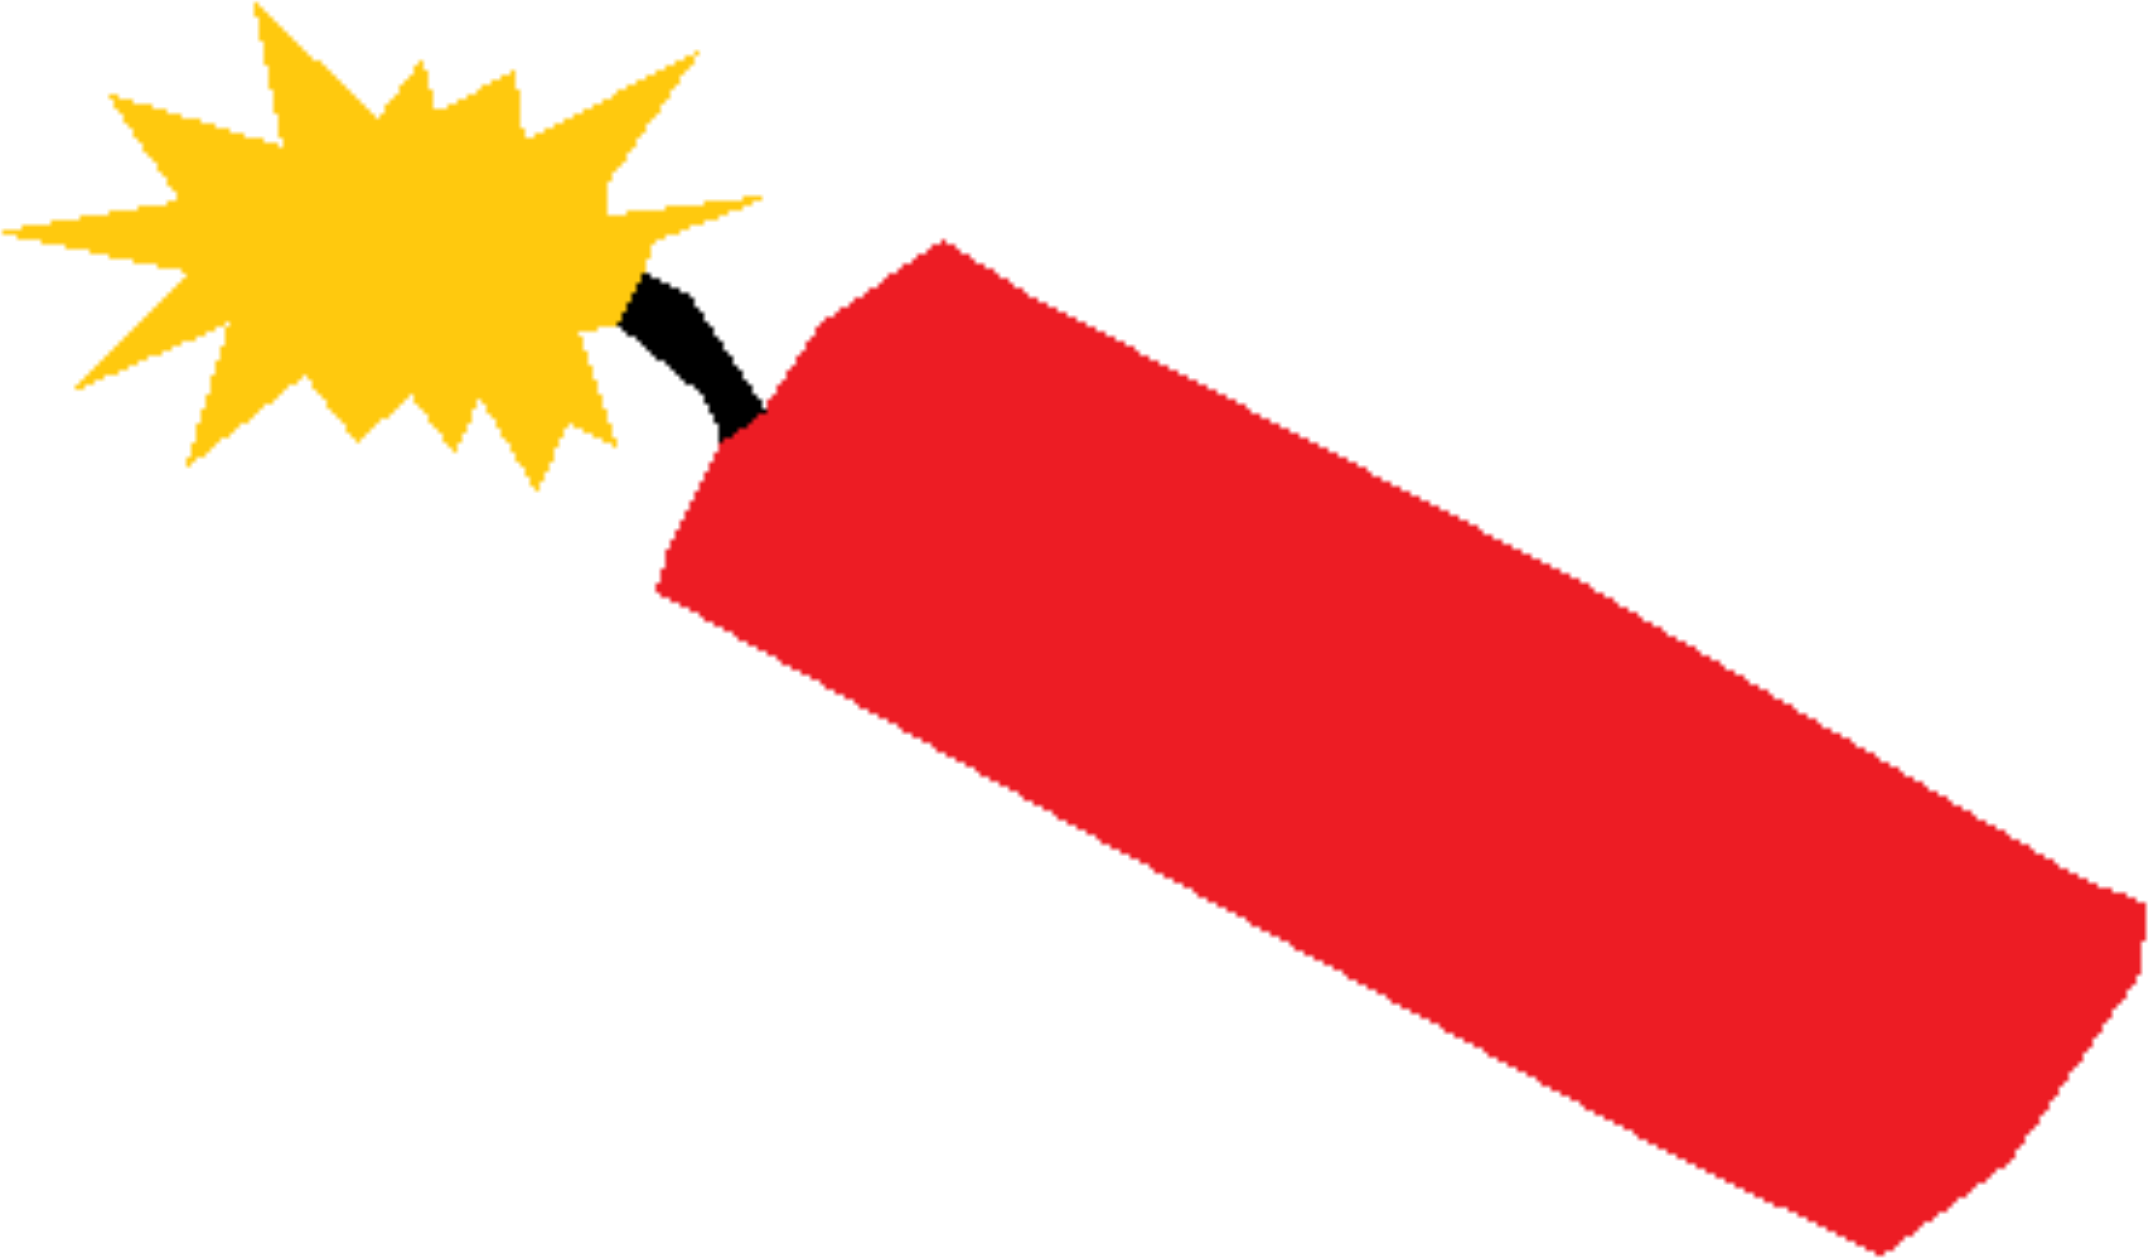 Firecracker clipart. Big image png